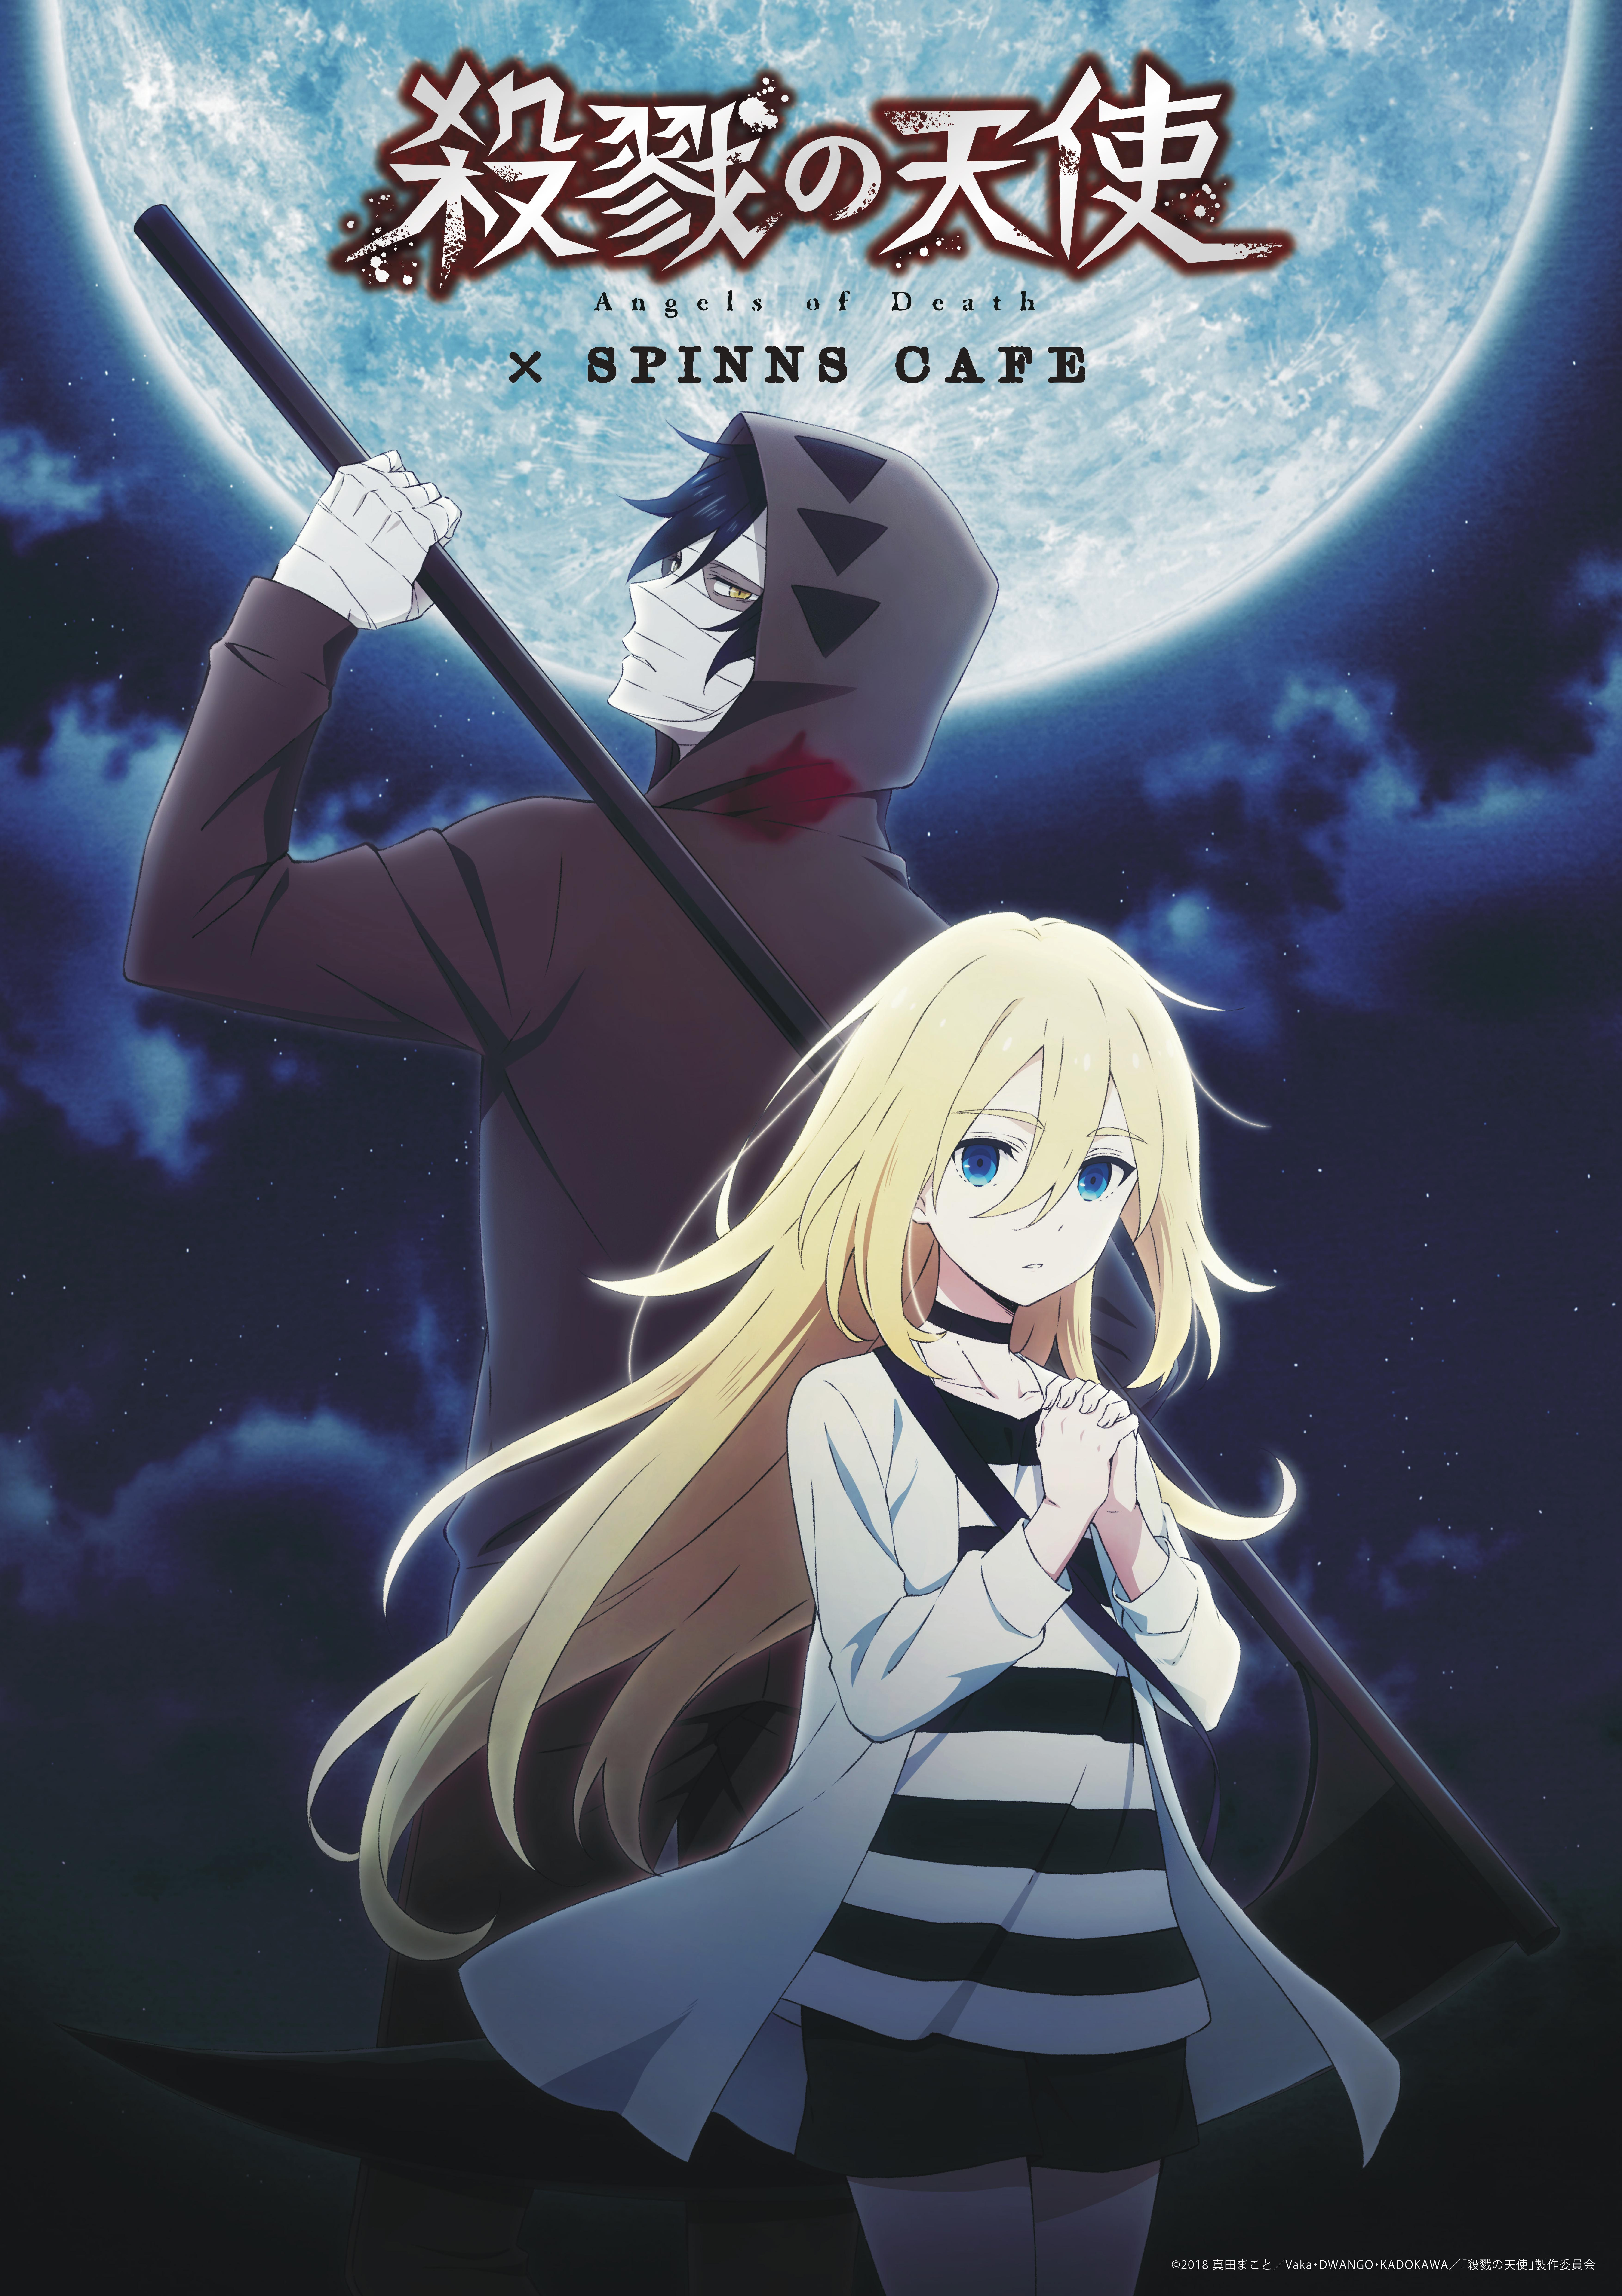 Satsuriku No Tenshi Angels Of Death Zerochan Anime Image Board